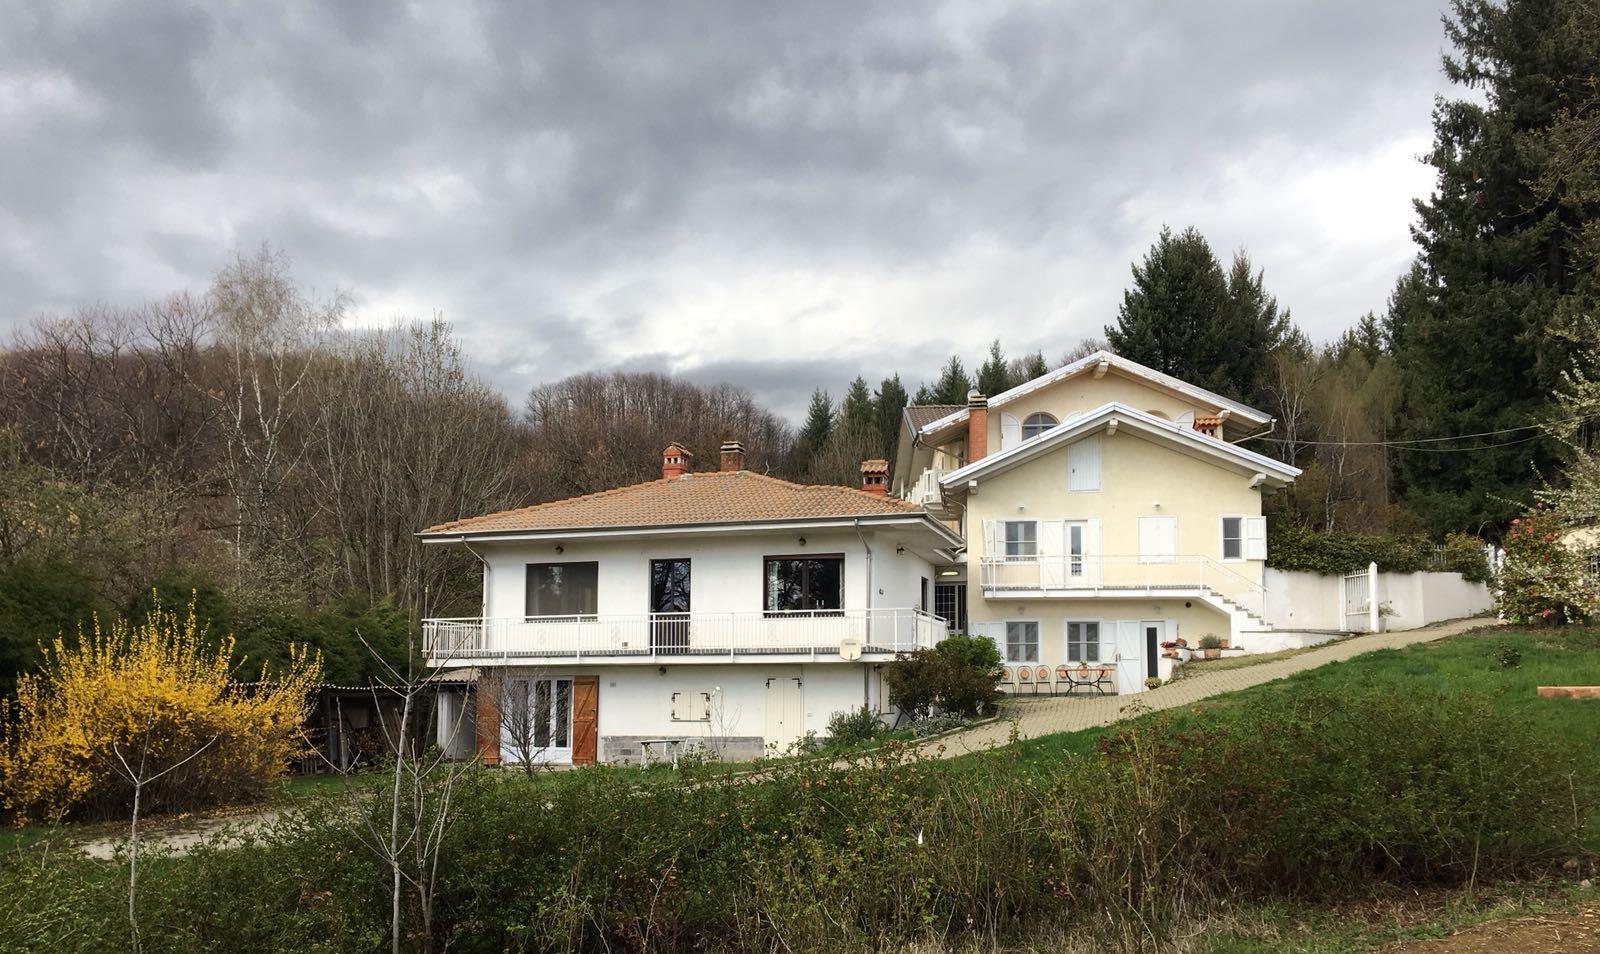 Mainhouses